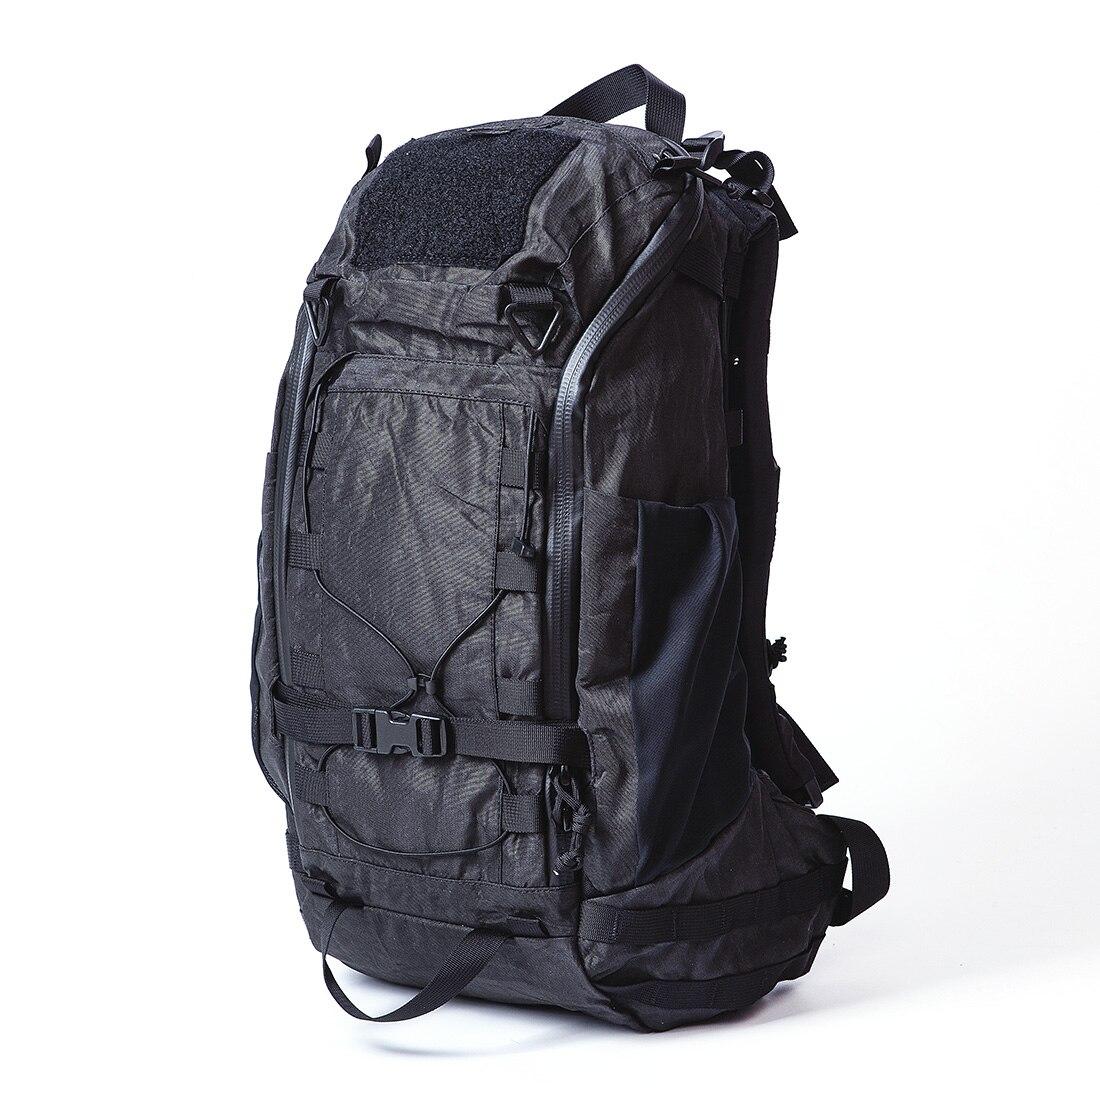 Lii Gear 25L Fugu Bomb Multifunctional Tactical Backpack Tactics Accessories For Men Women - Black (Universal Edition)